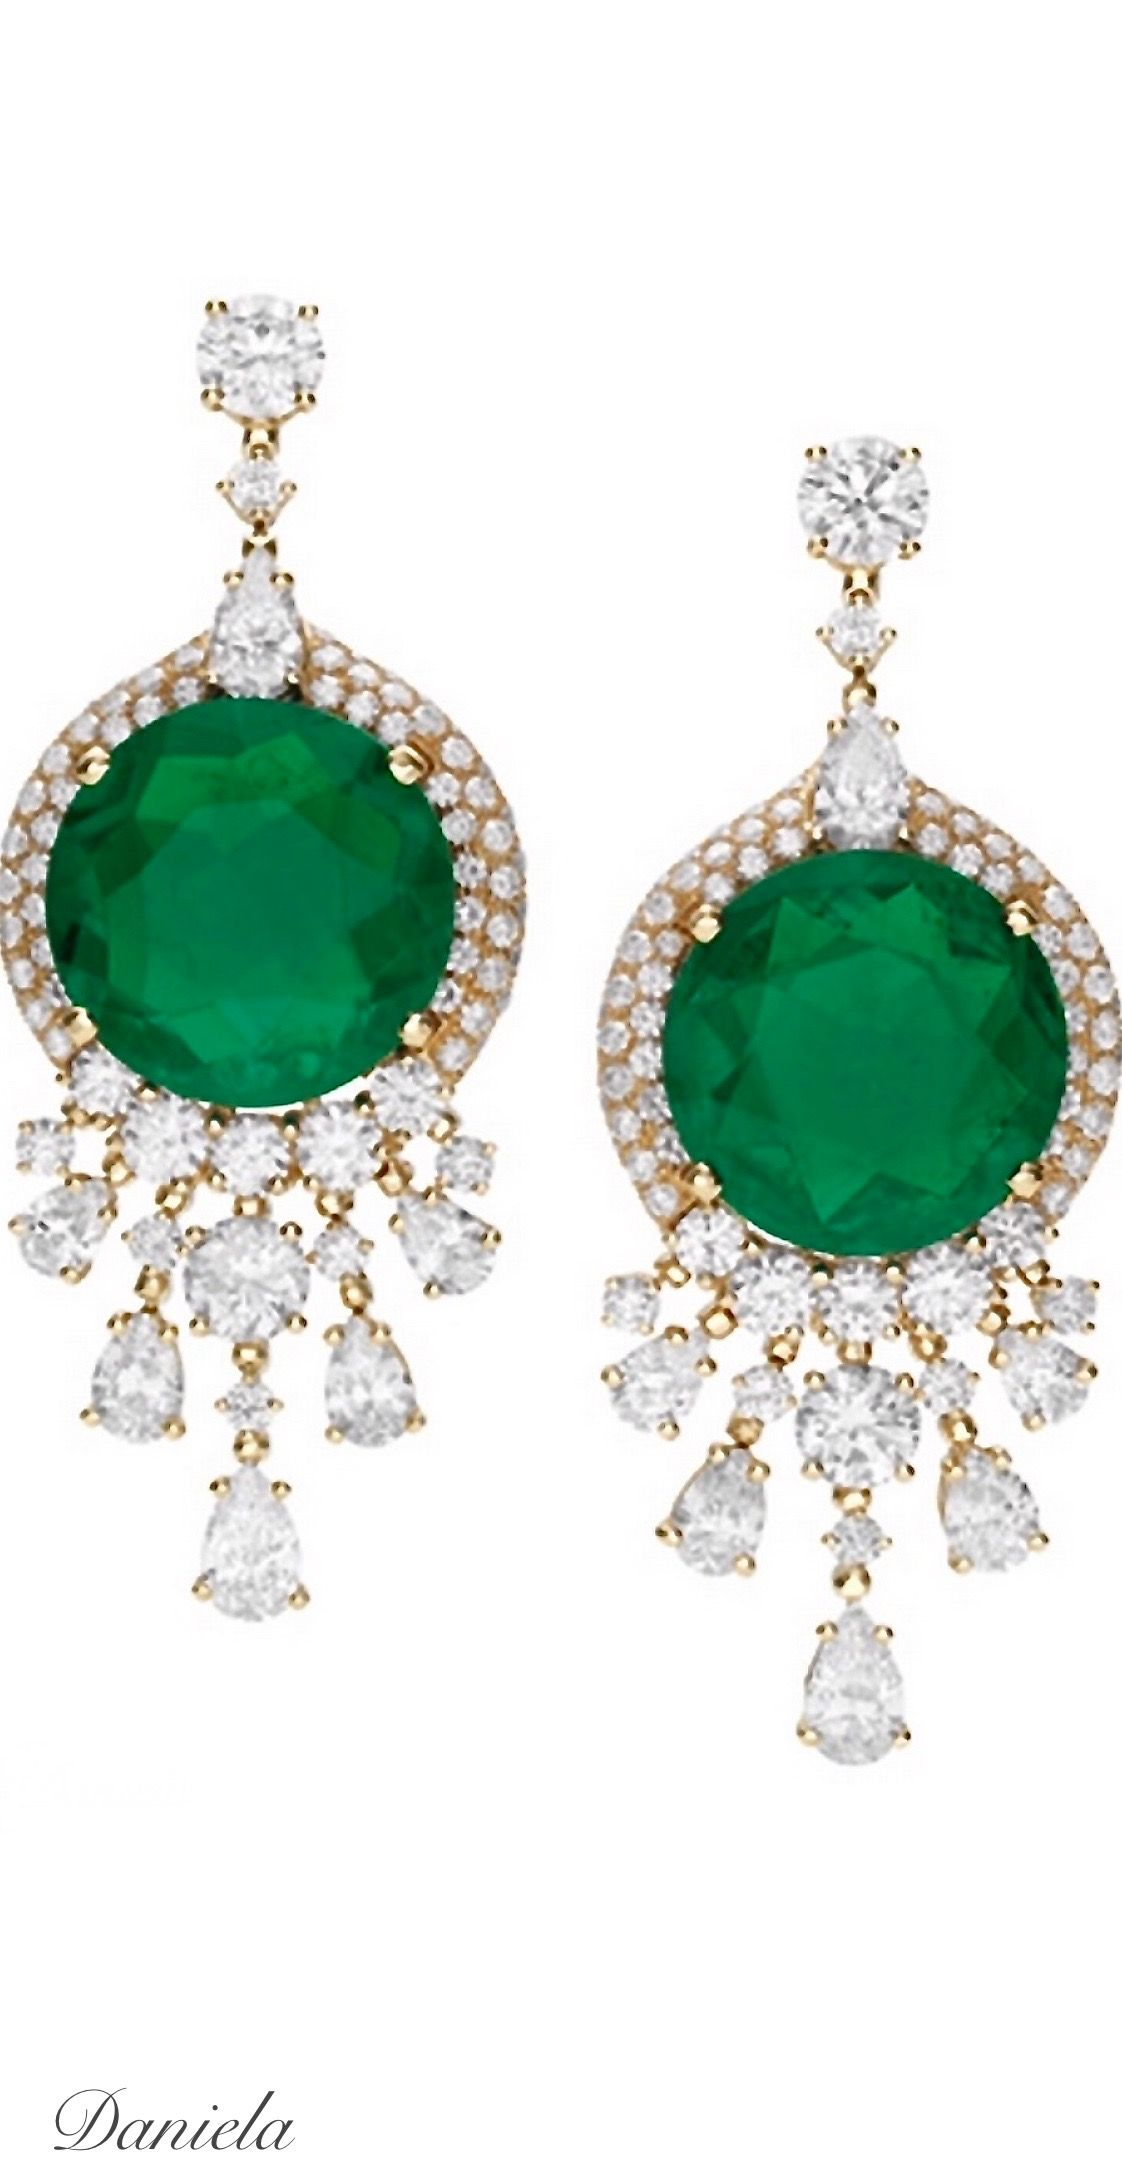 d255894139e54 Bulgari Earrings | for d ears | Jewelry, Bulgari jewelry, Jewelry ...